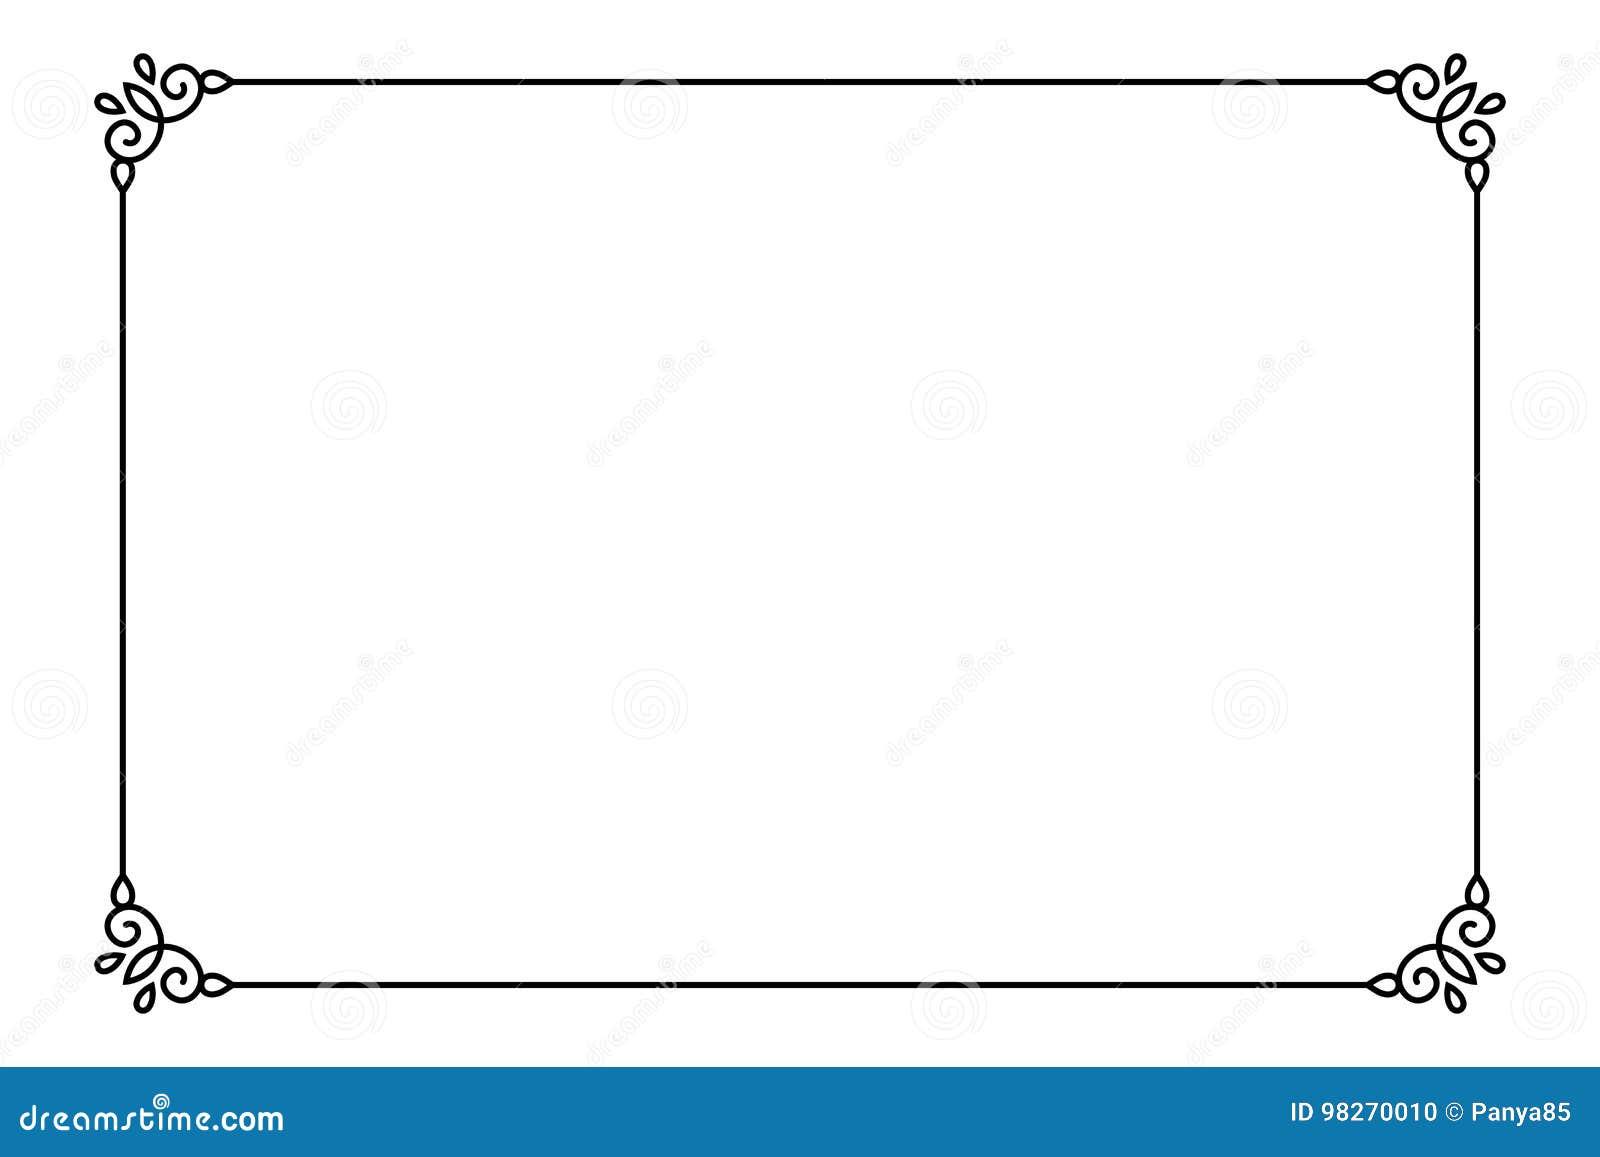 Ornamental Decorative Page Frame  Vector Line Style Border